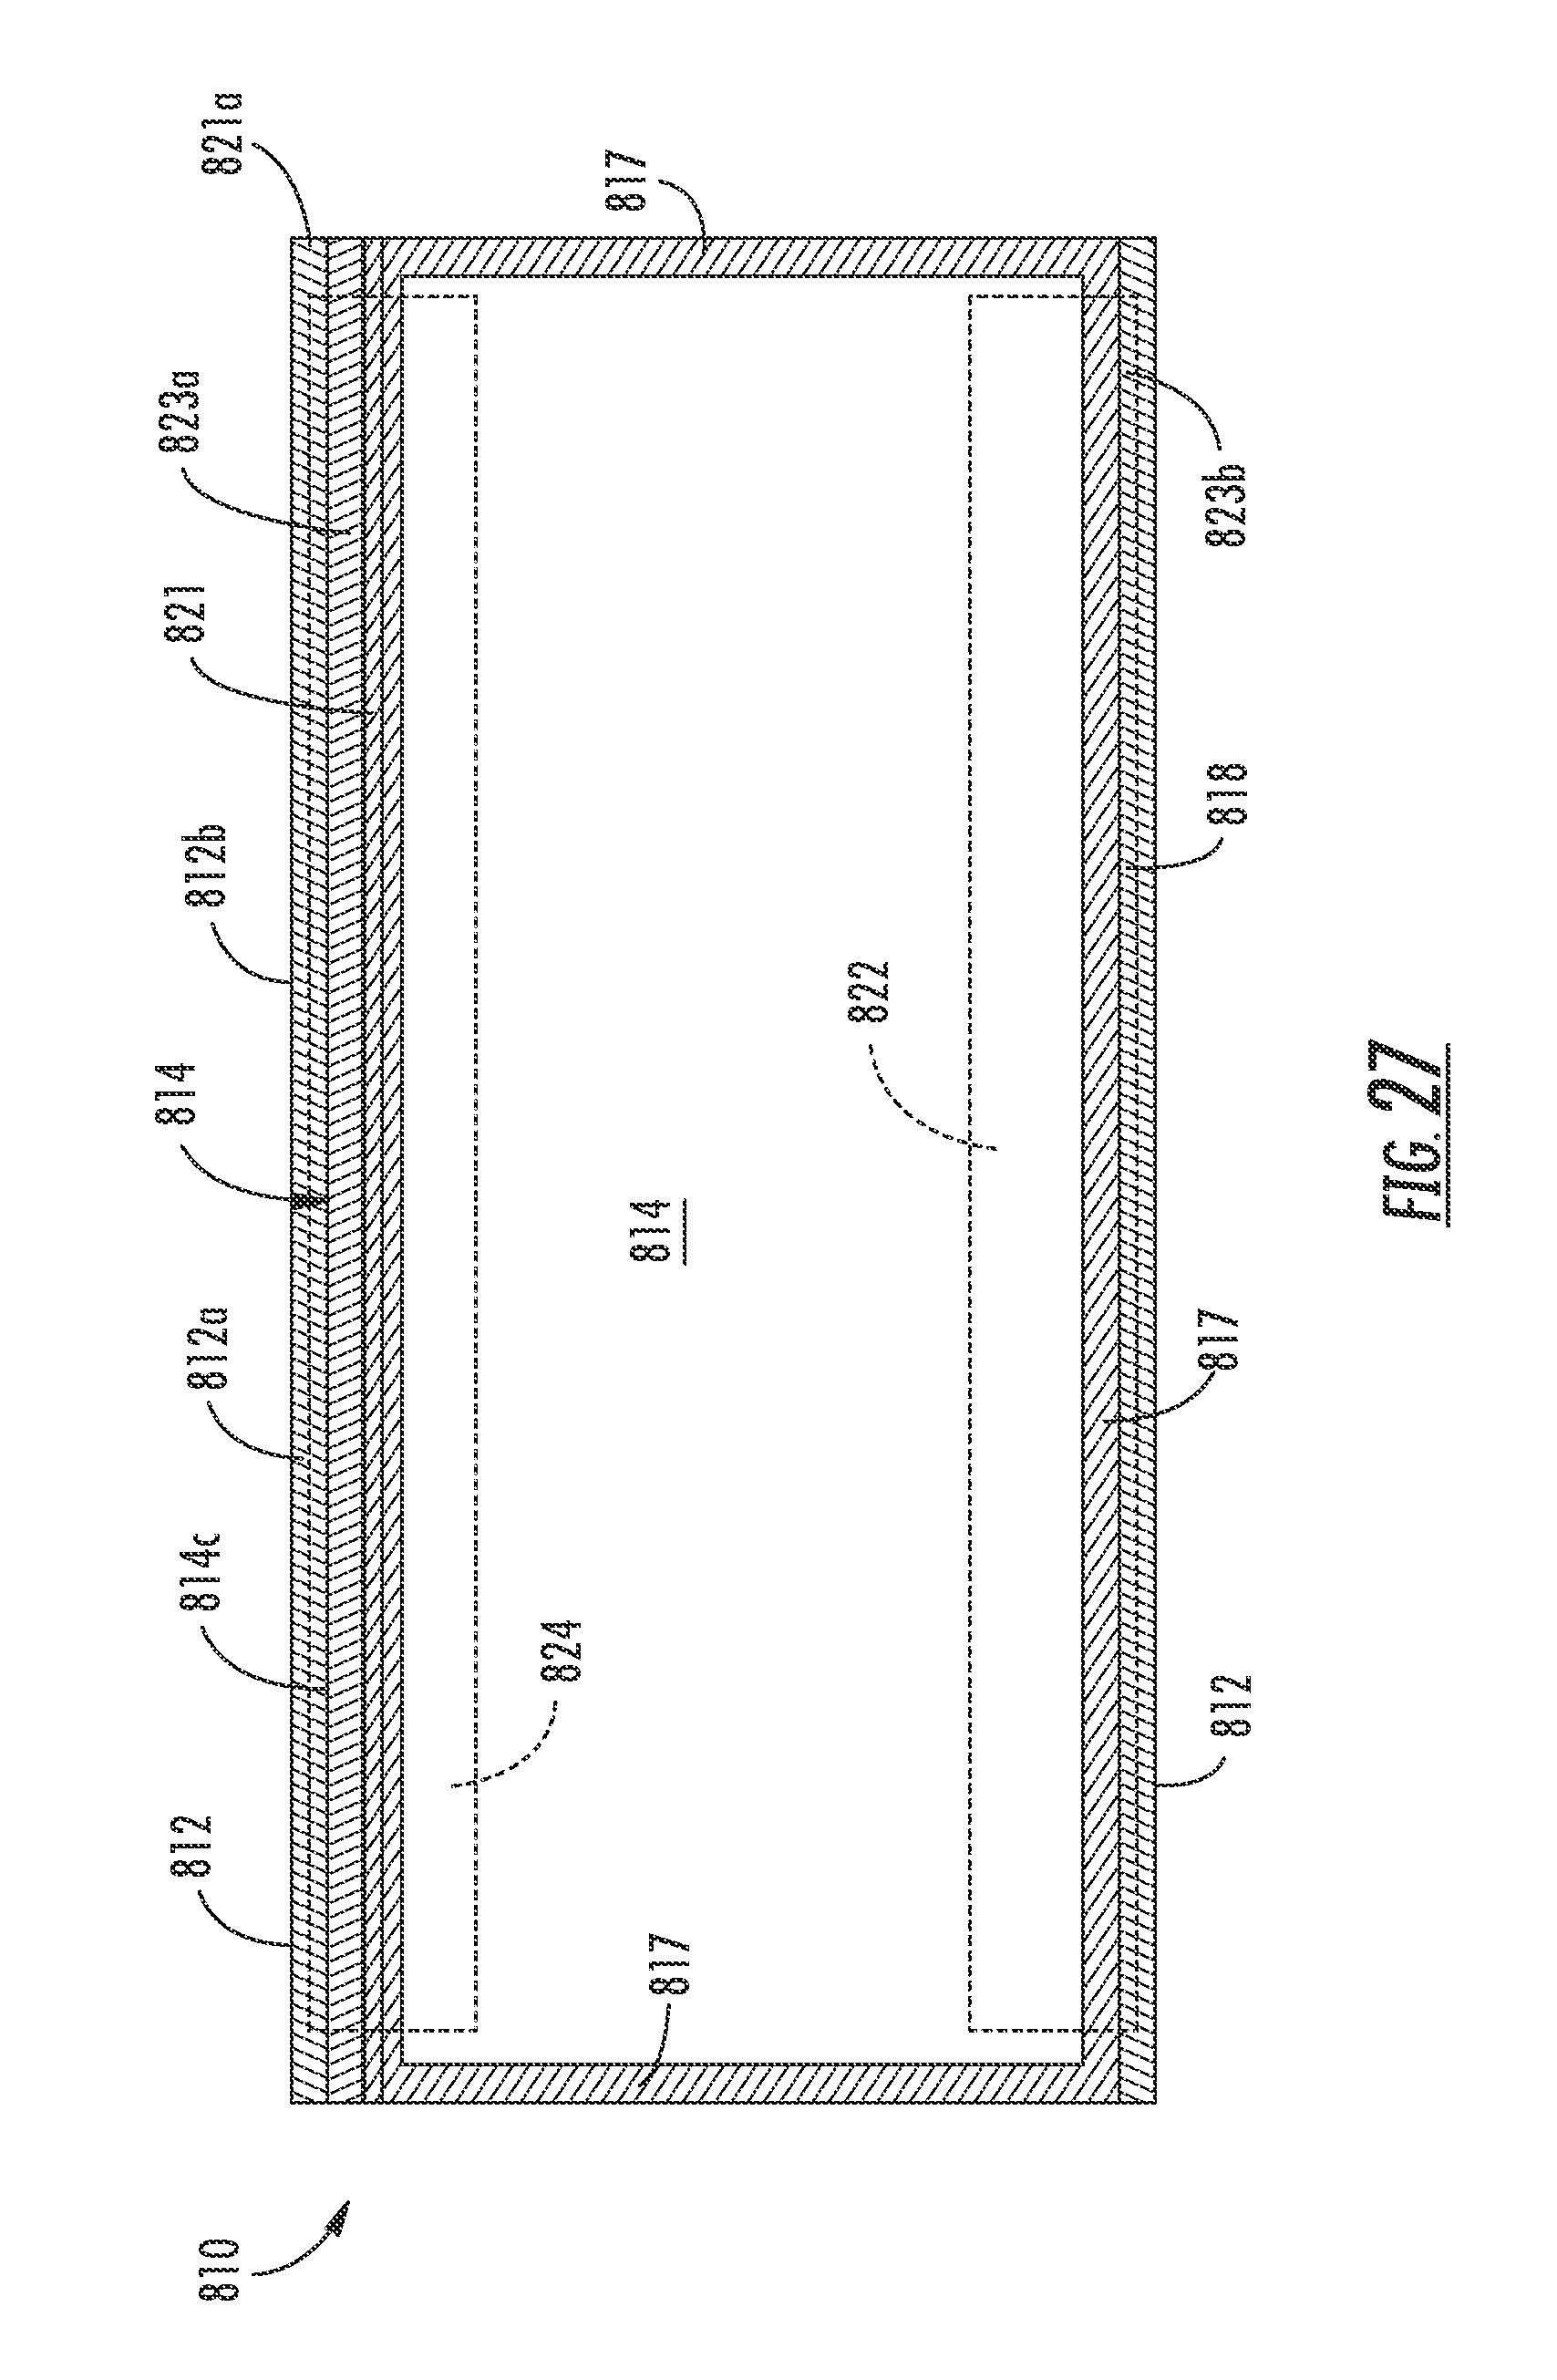 Patent US 8,335,032 B2